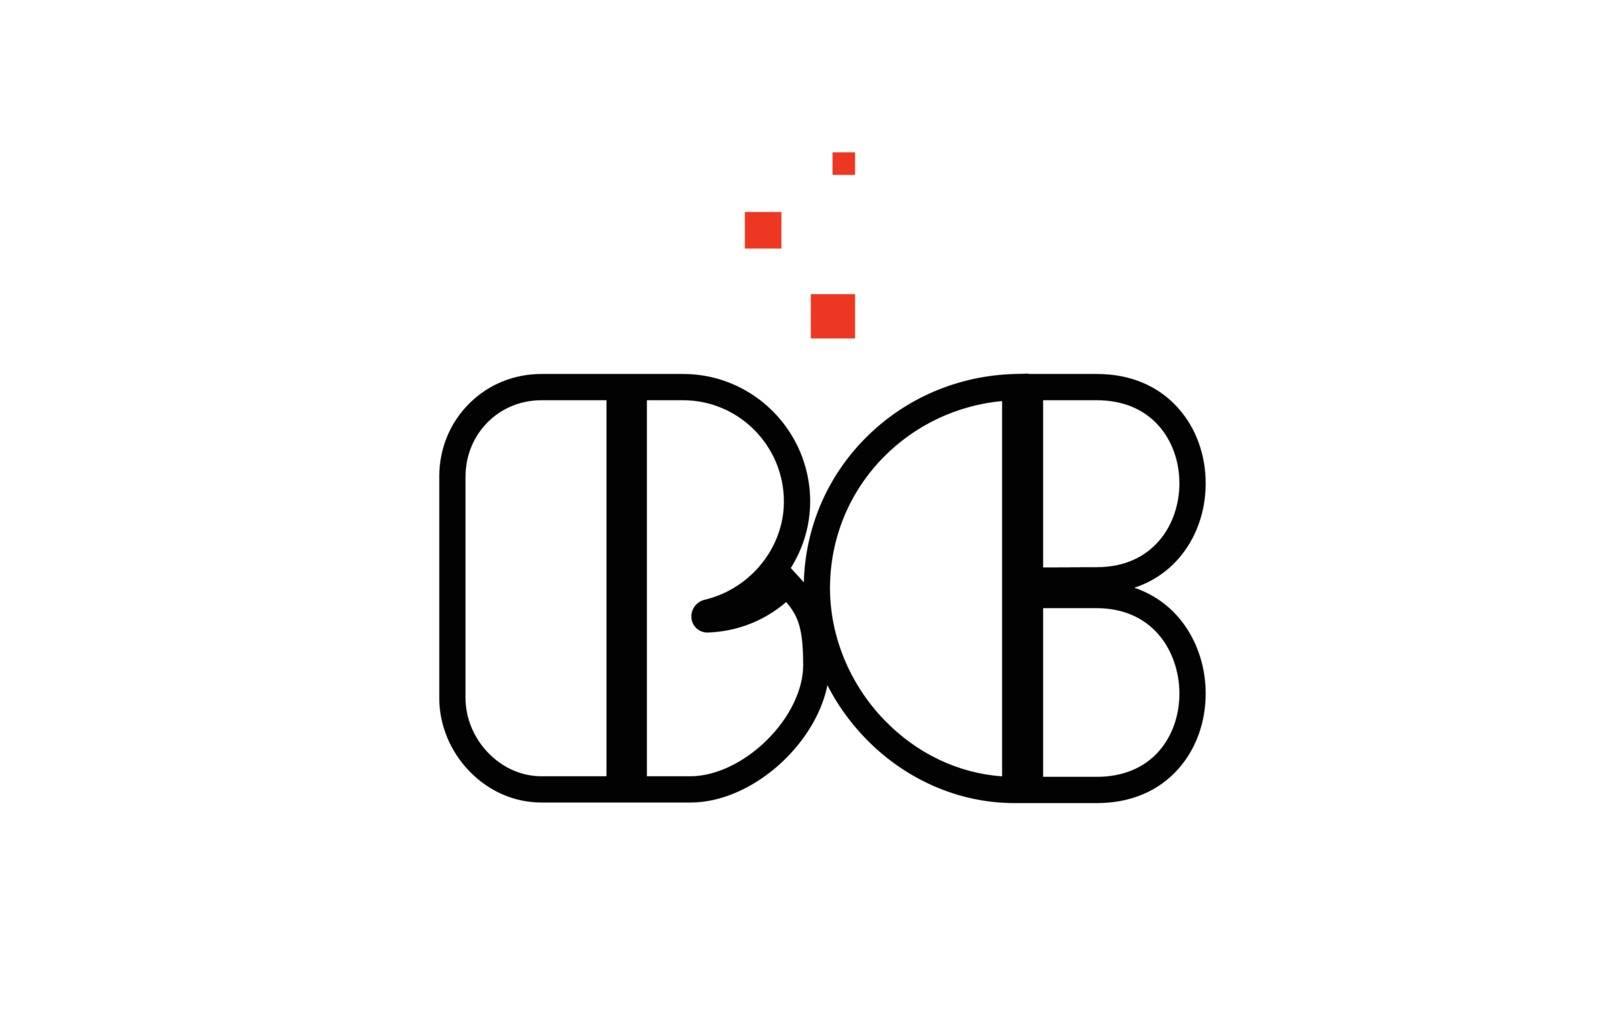 BC B C black white red alphabet letter combination logo icon des by dragomirescu